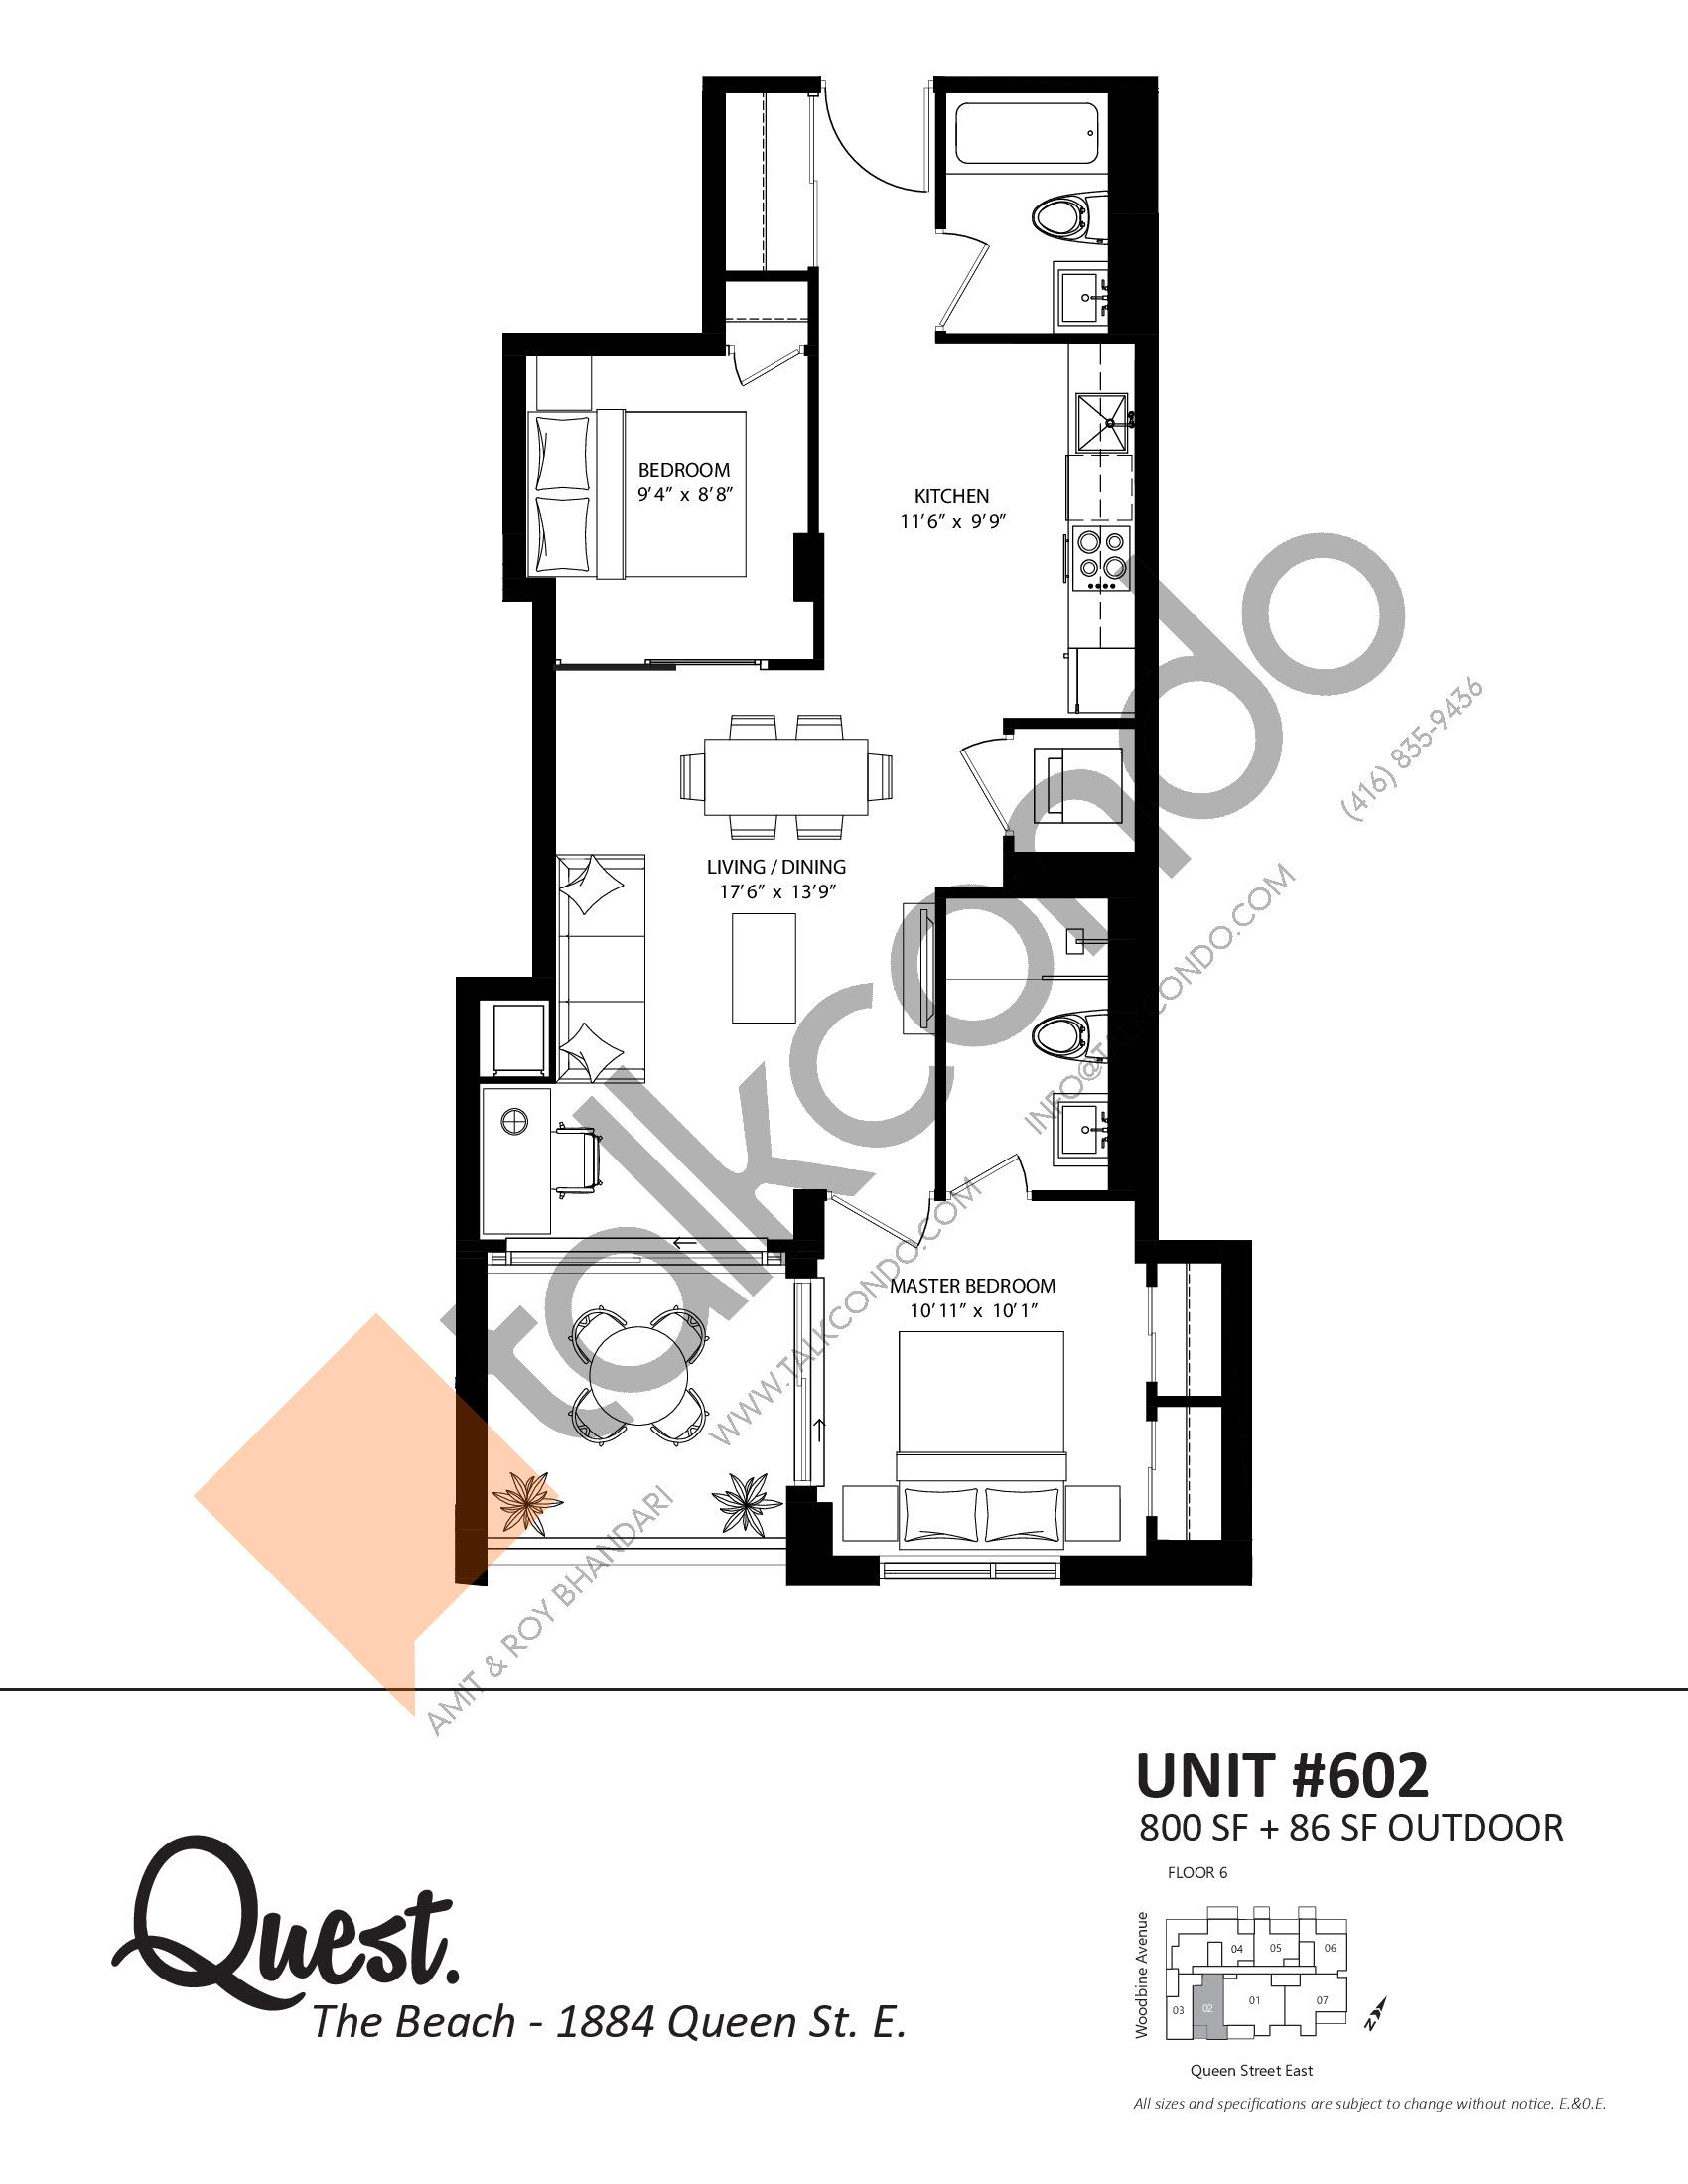 Unit 602 Floor Plan at Heartwood the Beach Condos - 800 sq.ft